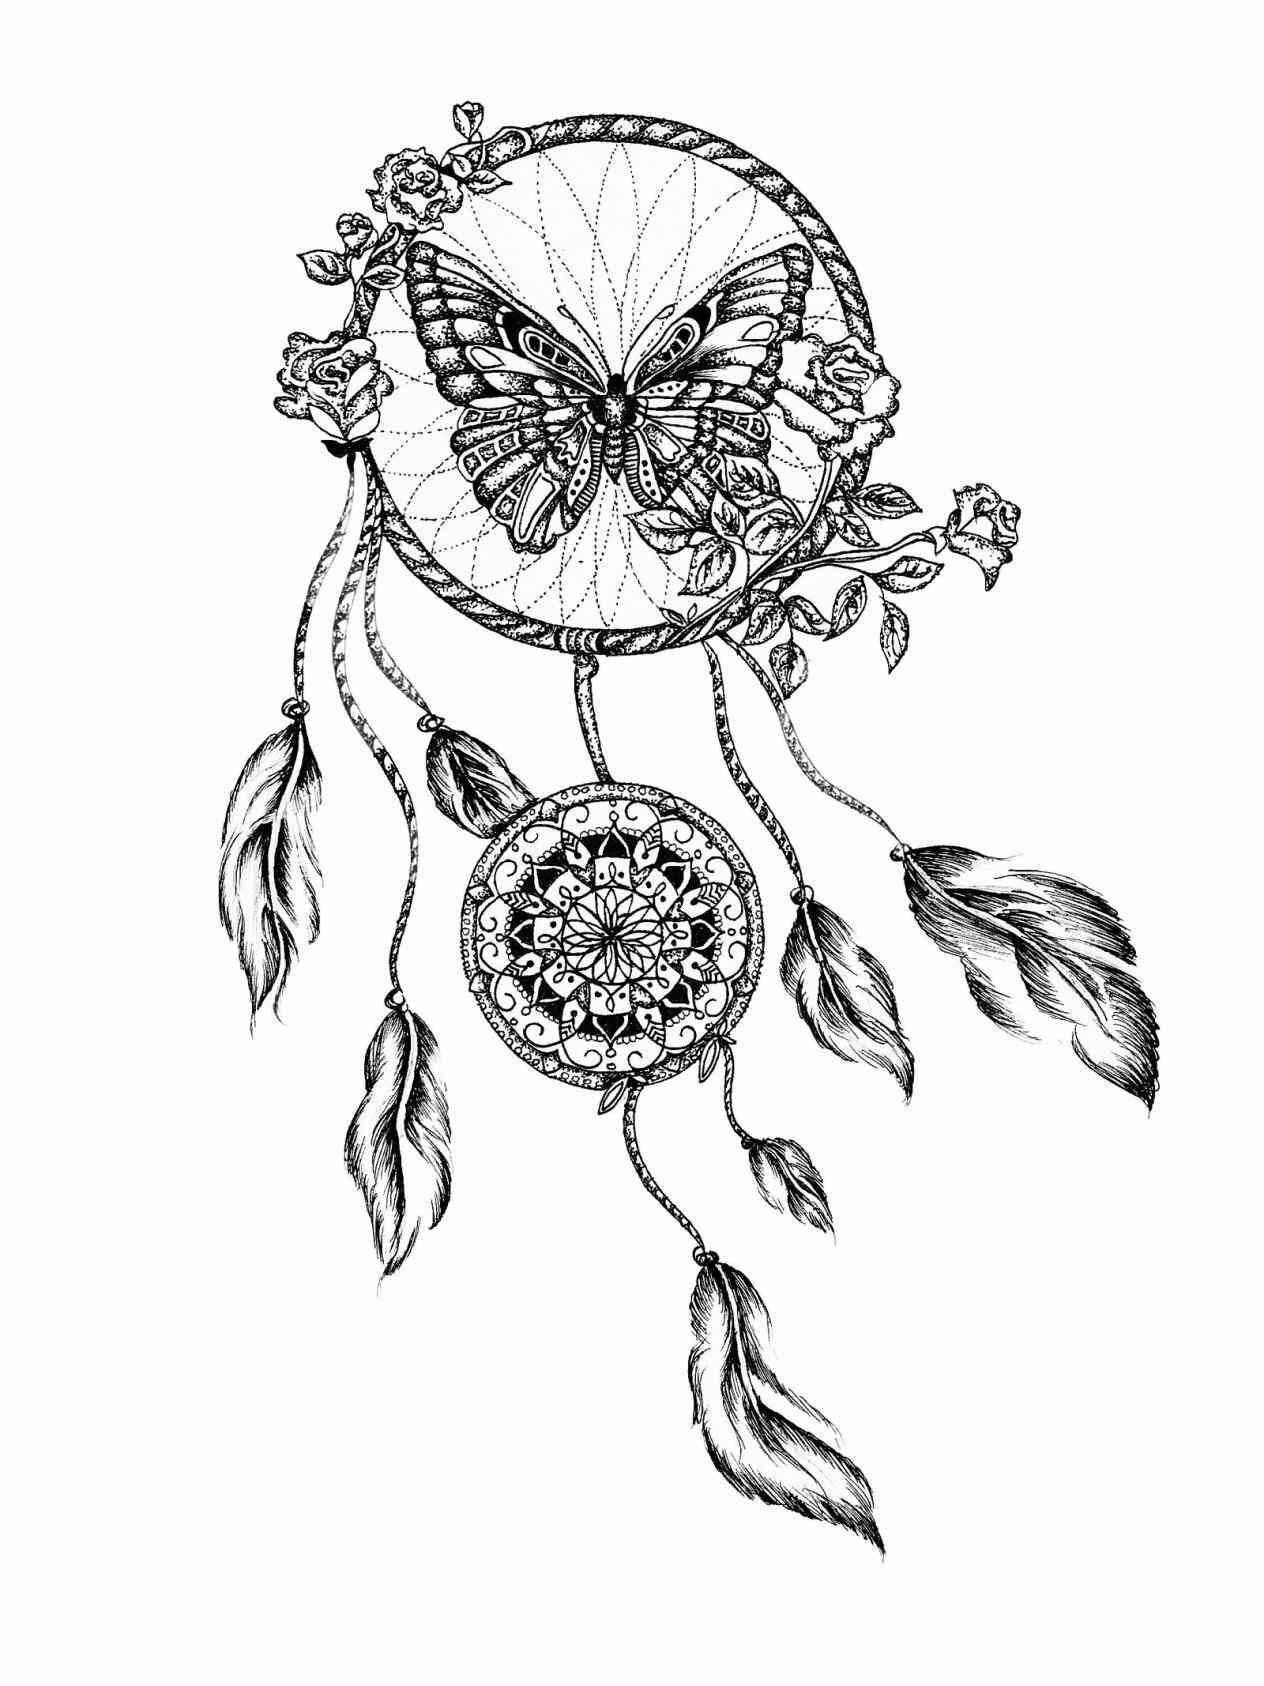 1264x1686 Dreamcatcher Drawings